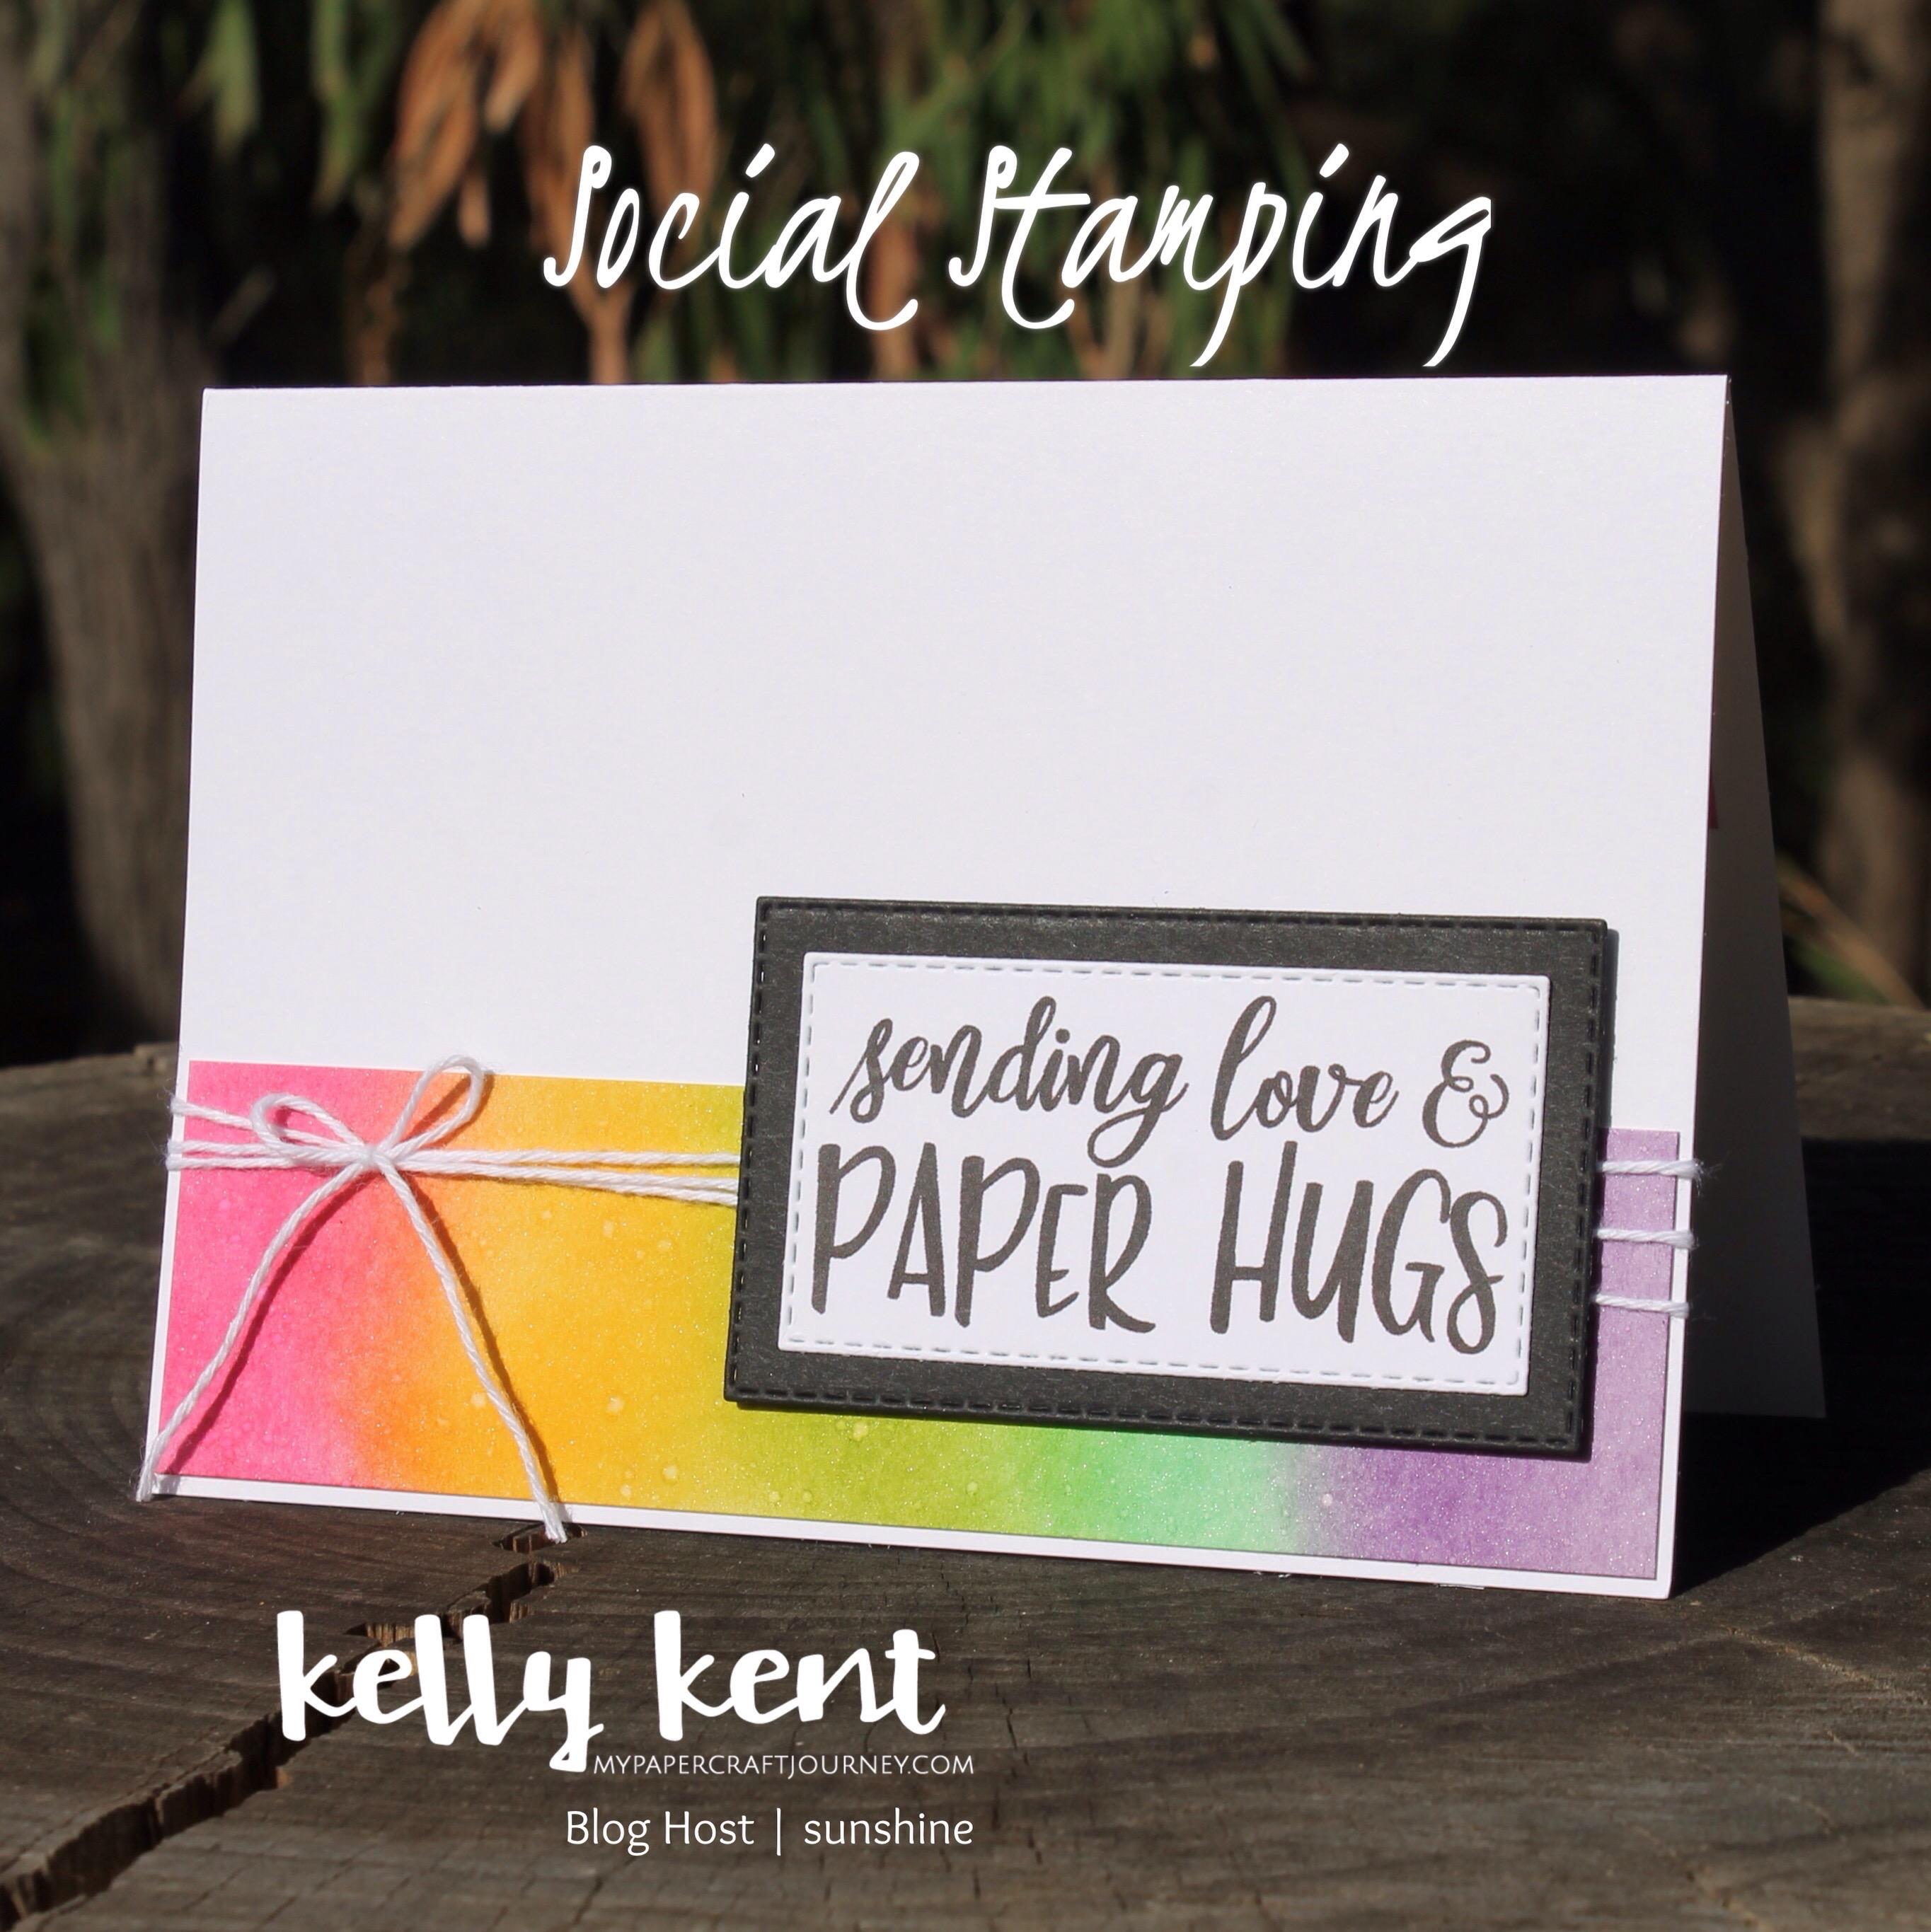 Love & Paper Hugs | kelly kent